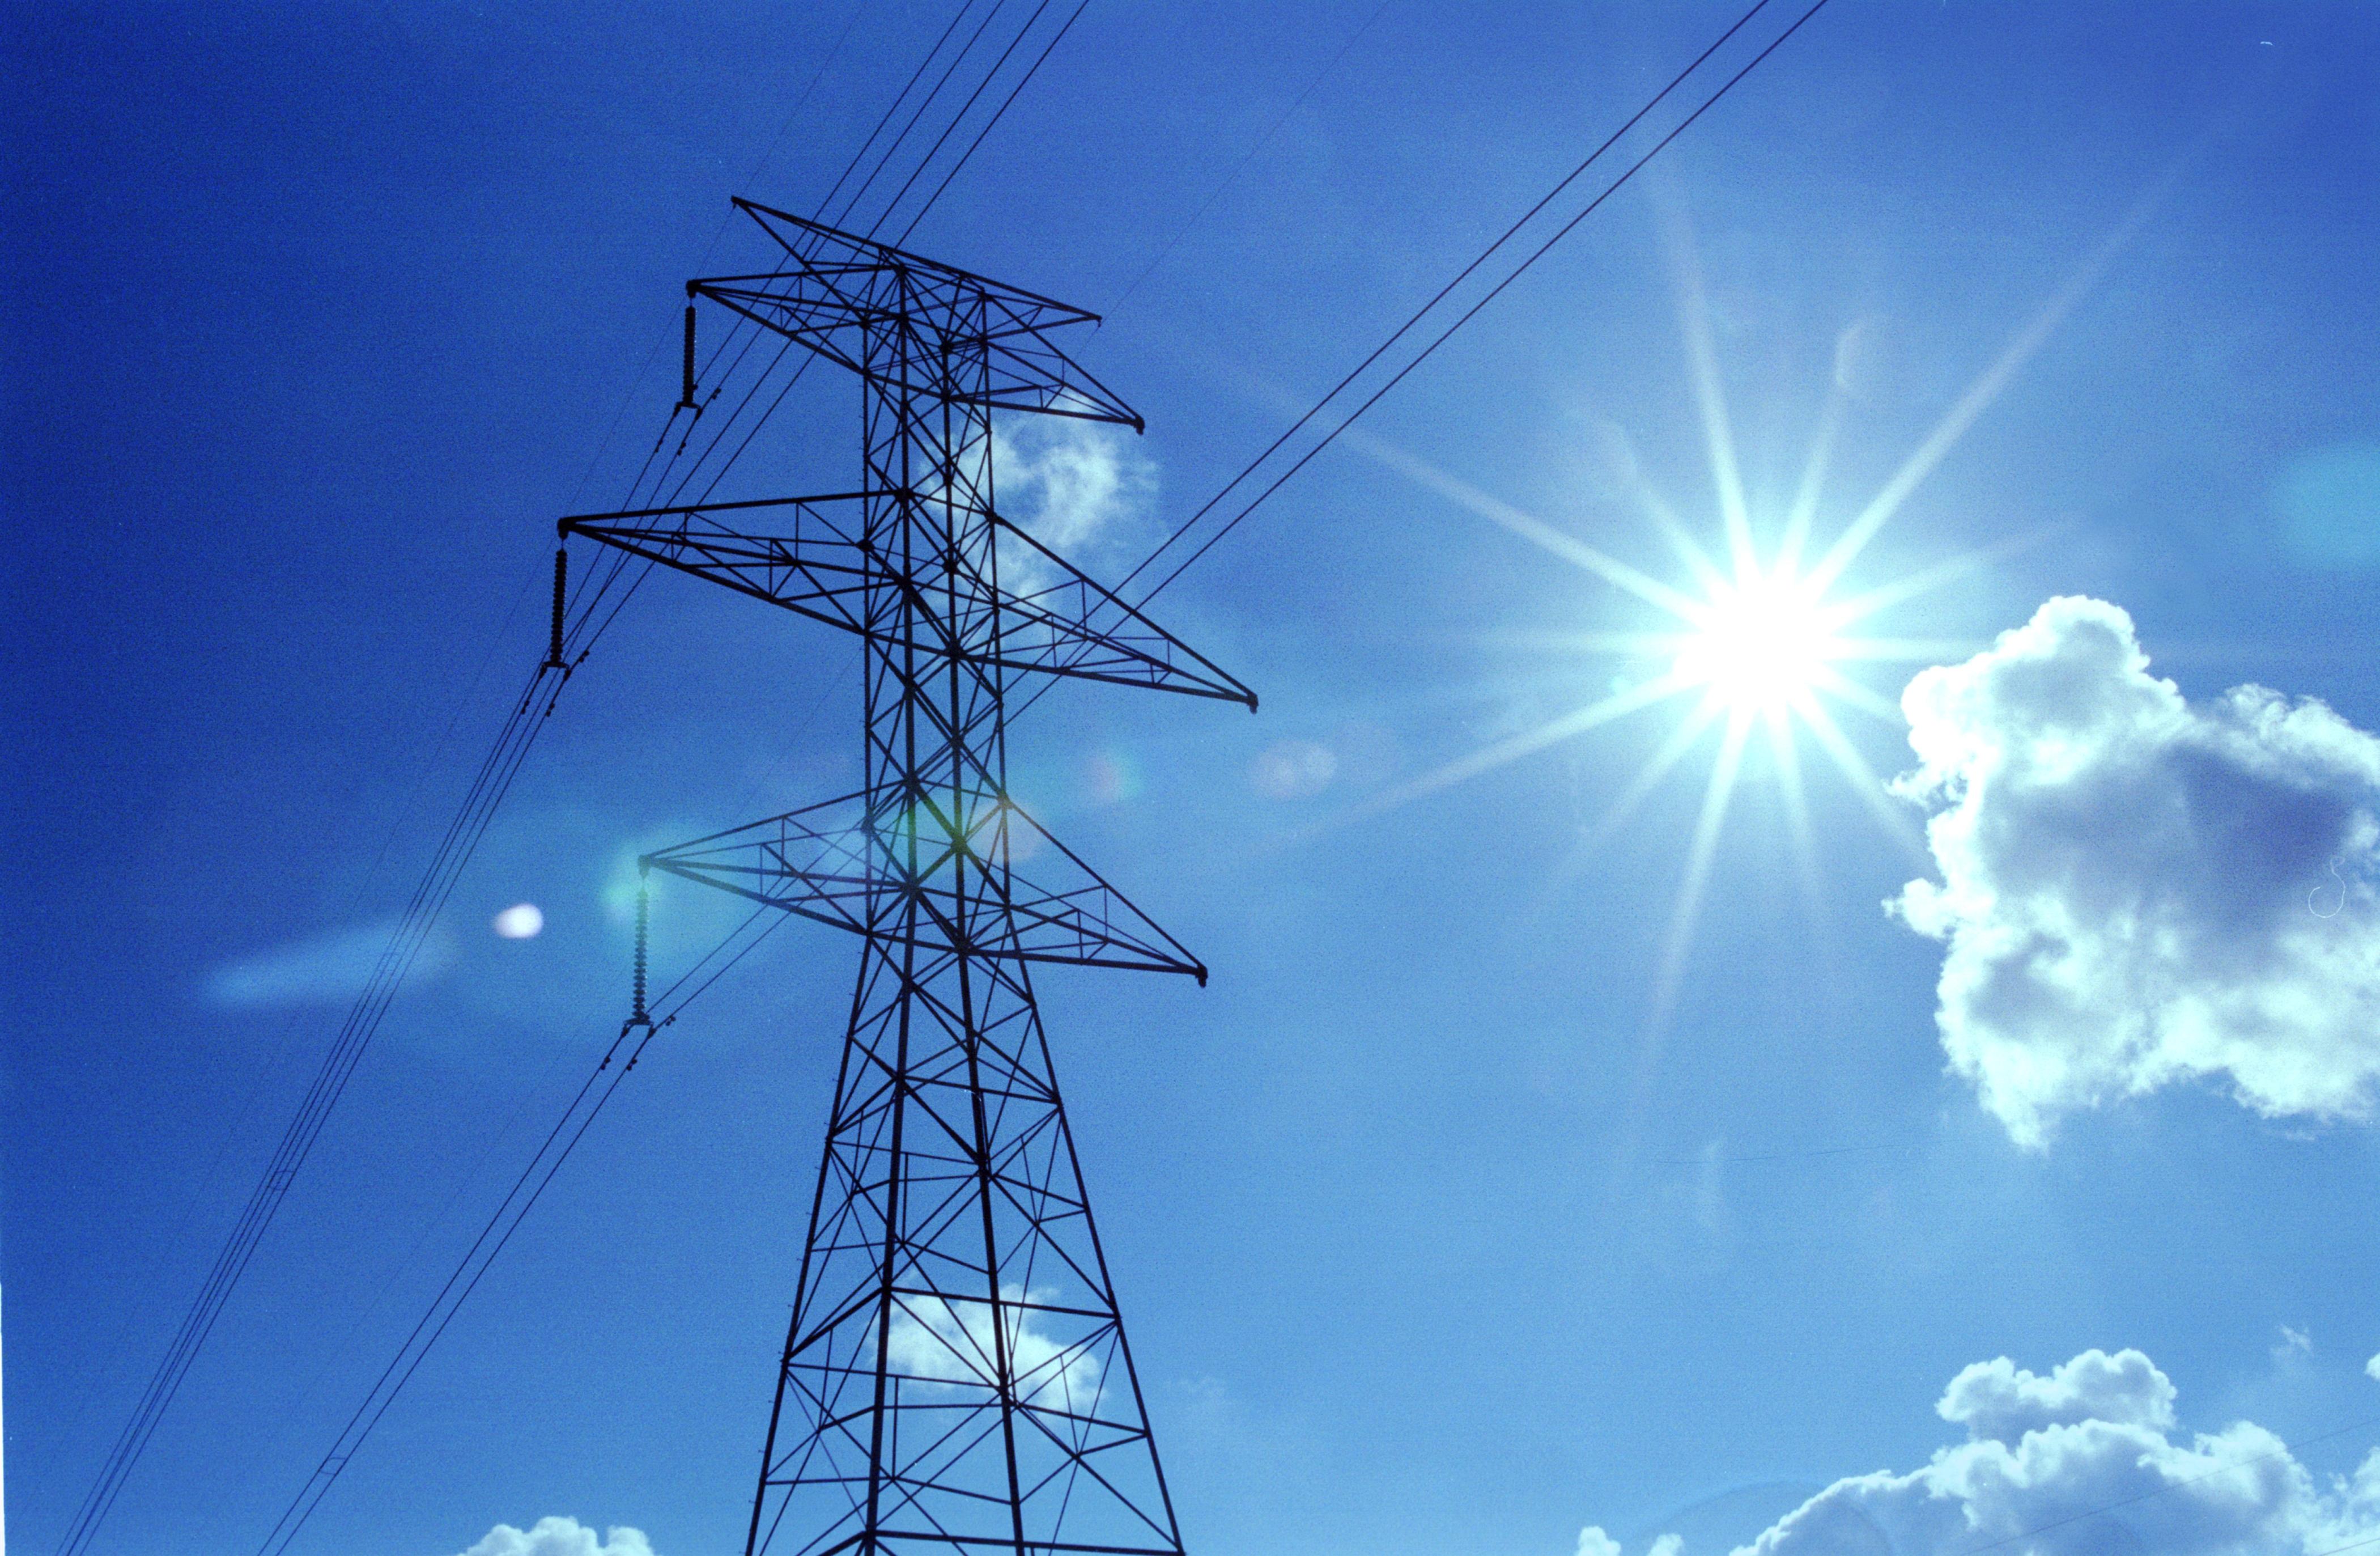 automatica energy essay